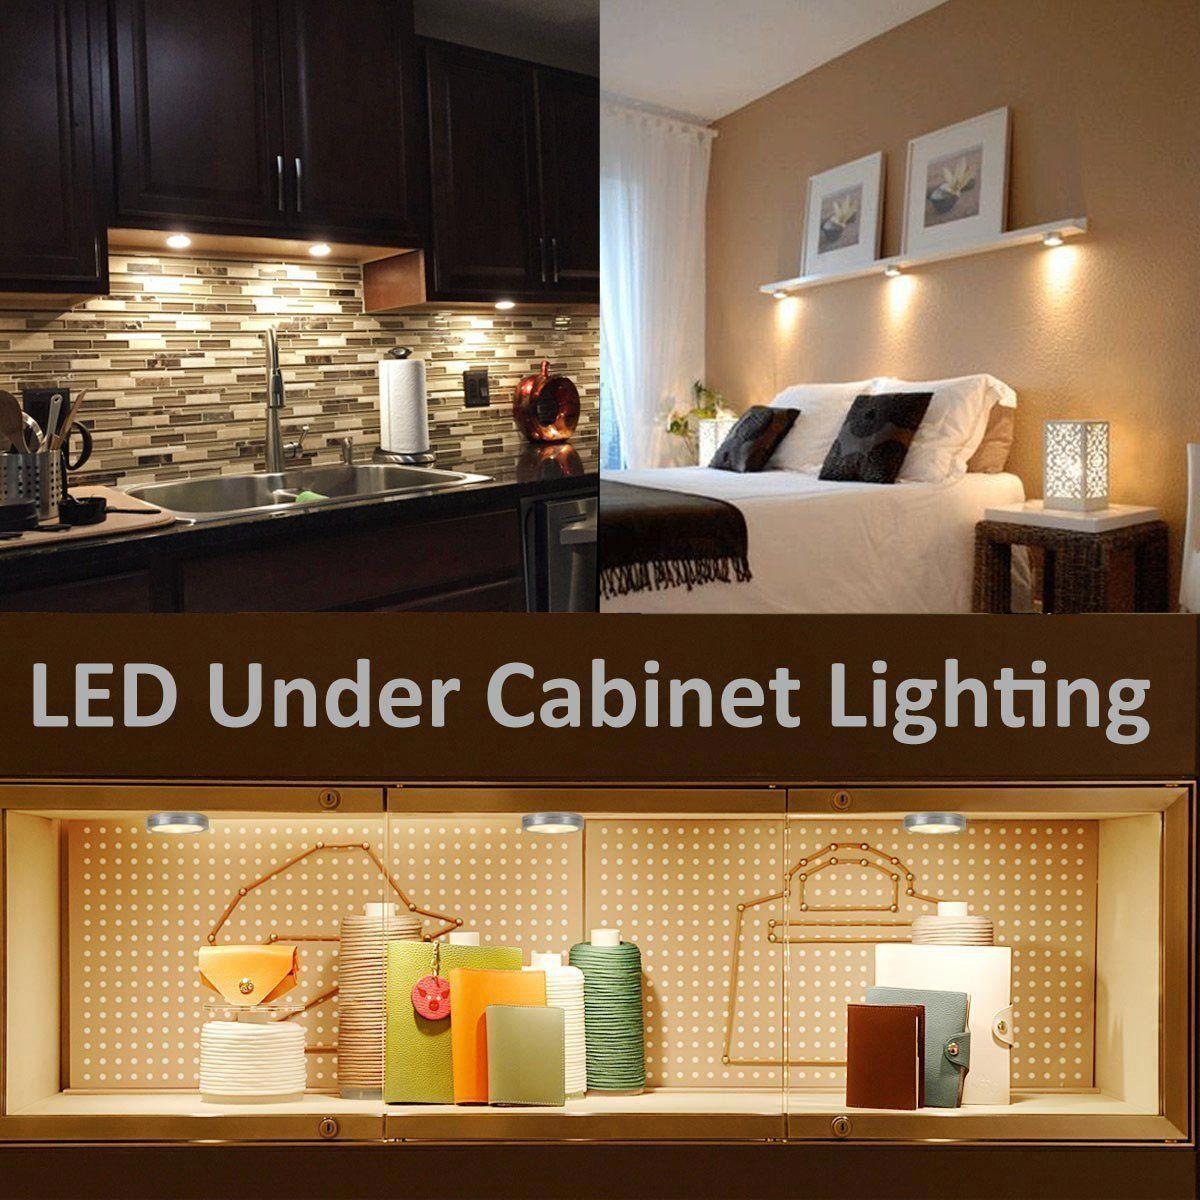 under cabinet lighting switch. StillCool Under Cabinet Lighting Home Kitchen Counter With Switch Control Recessed Lighting, Each I